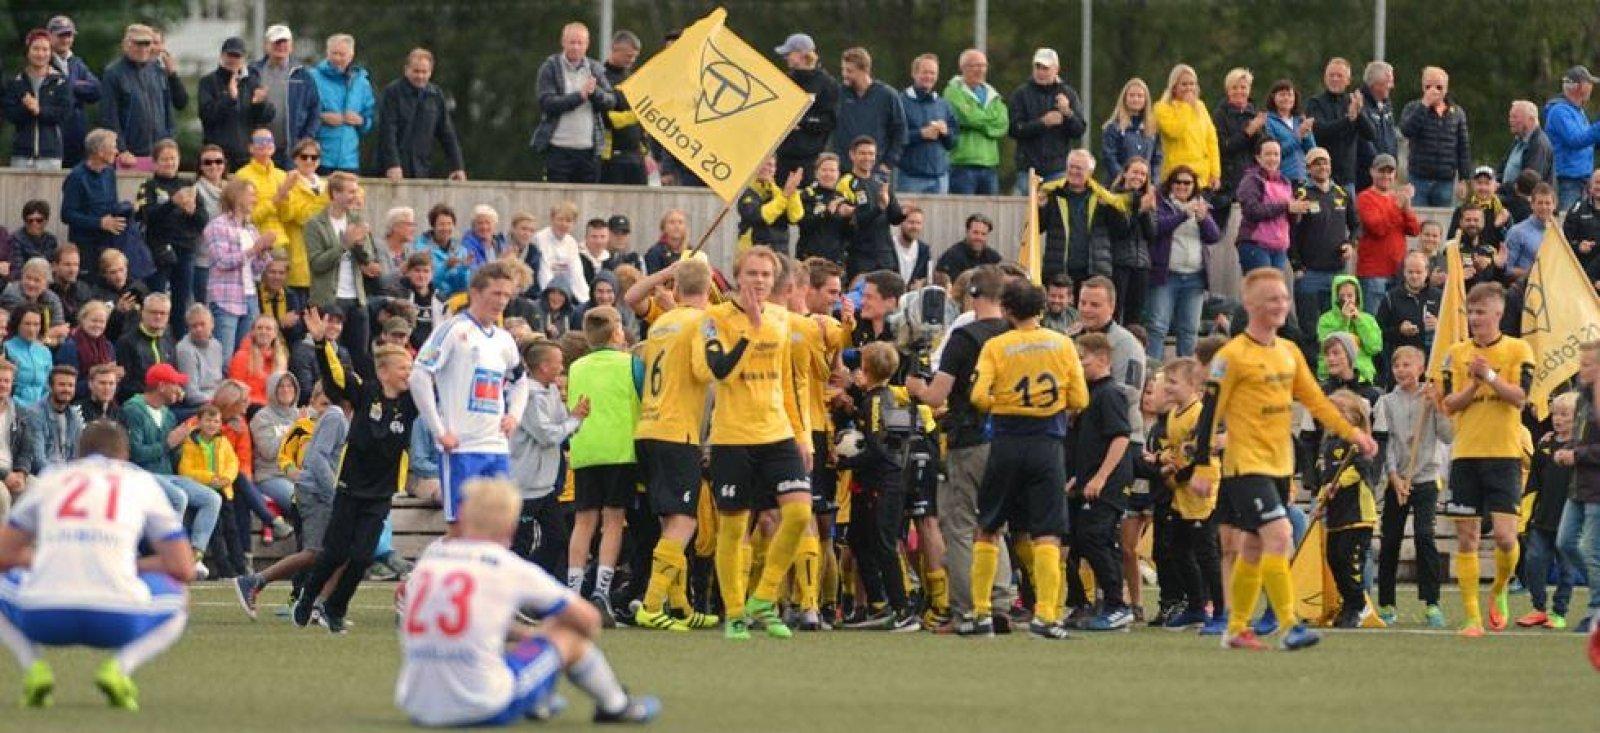 I 2017 blei det målfest på Kuventræ! Os kunne juble for 4-3 siger etter fire skåringar av Christoffer Hafsås (Foto: Hordalandsfotball).